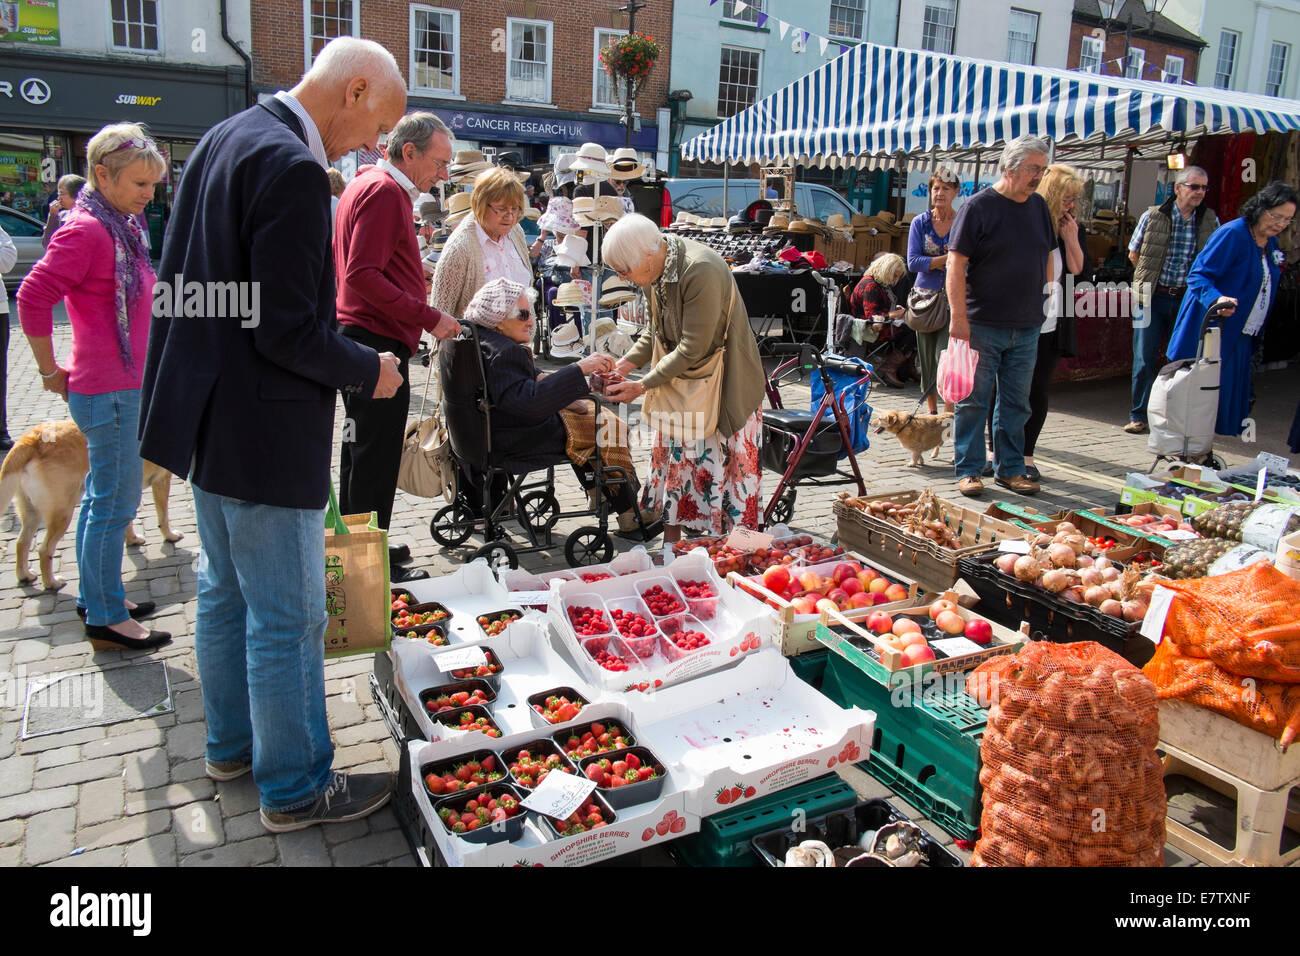 Fruit and vegetable stall at Ludlow street market Shropshire England UK - Stock Image